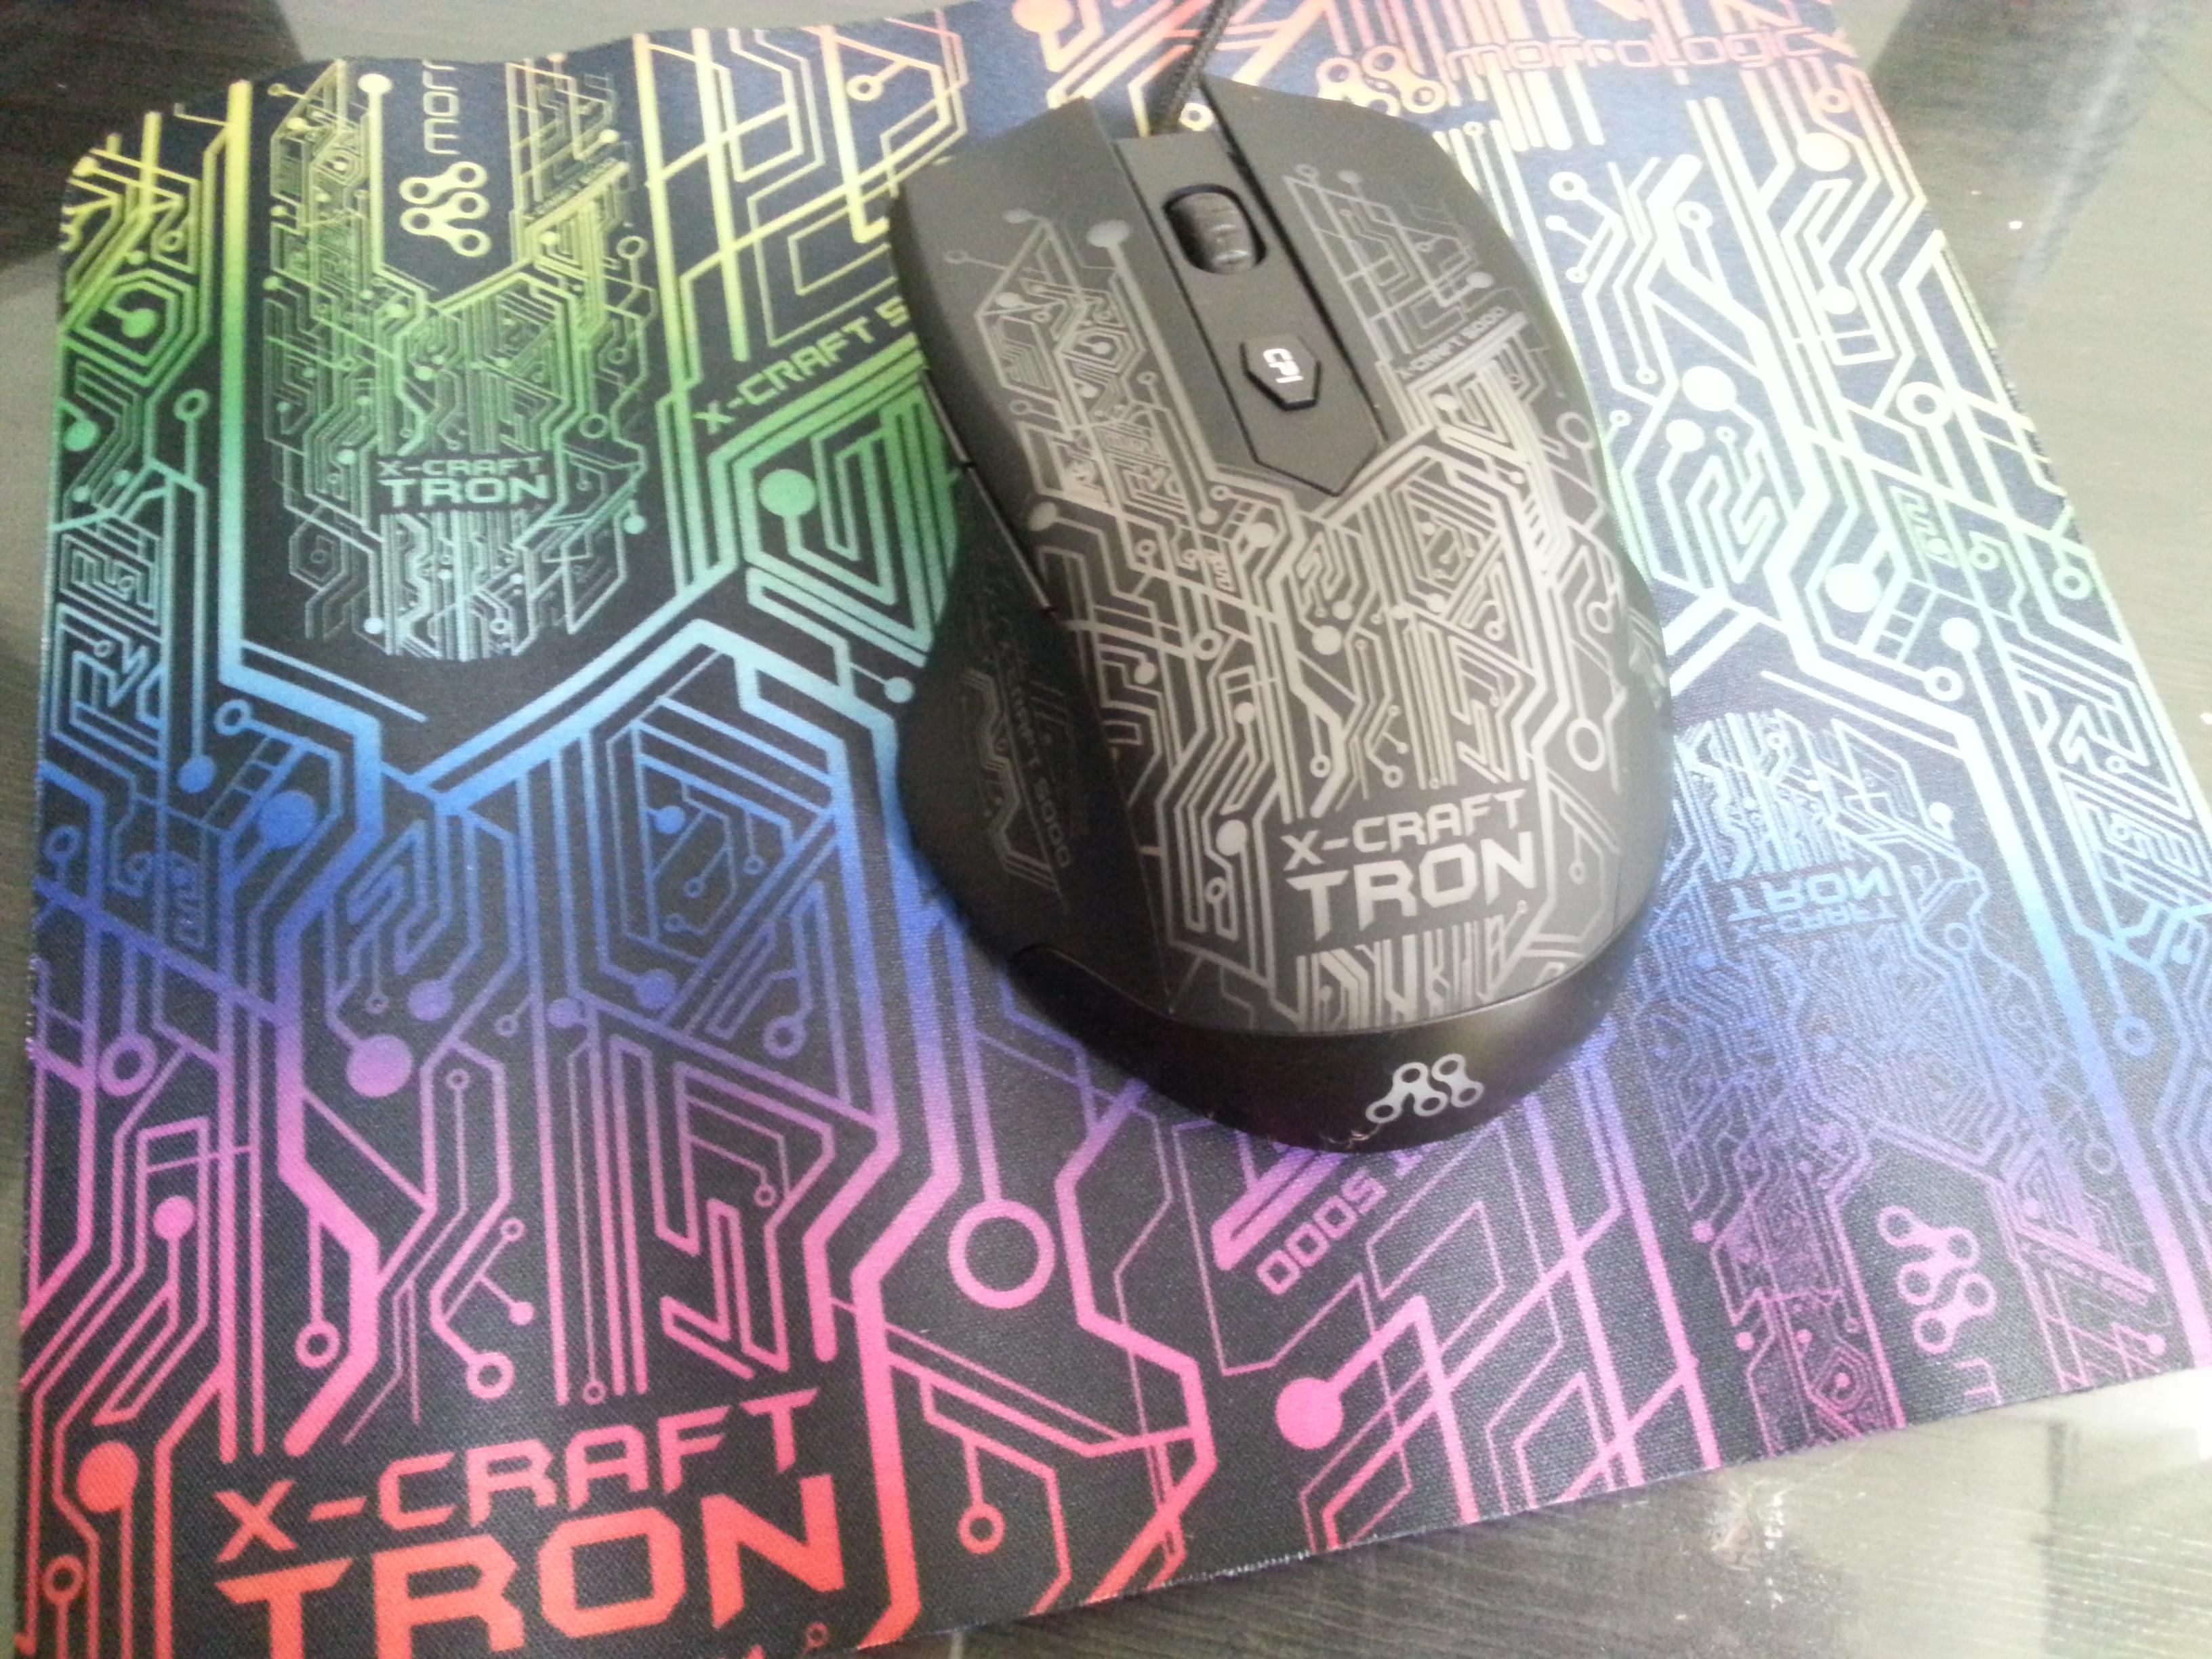 a1b1a46c16a Review] X-Craft Tron 5000 | The Lord of All Lords